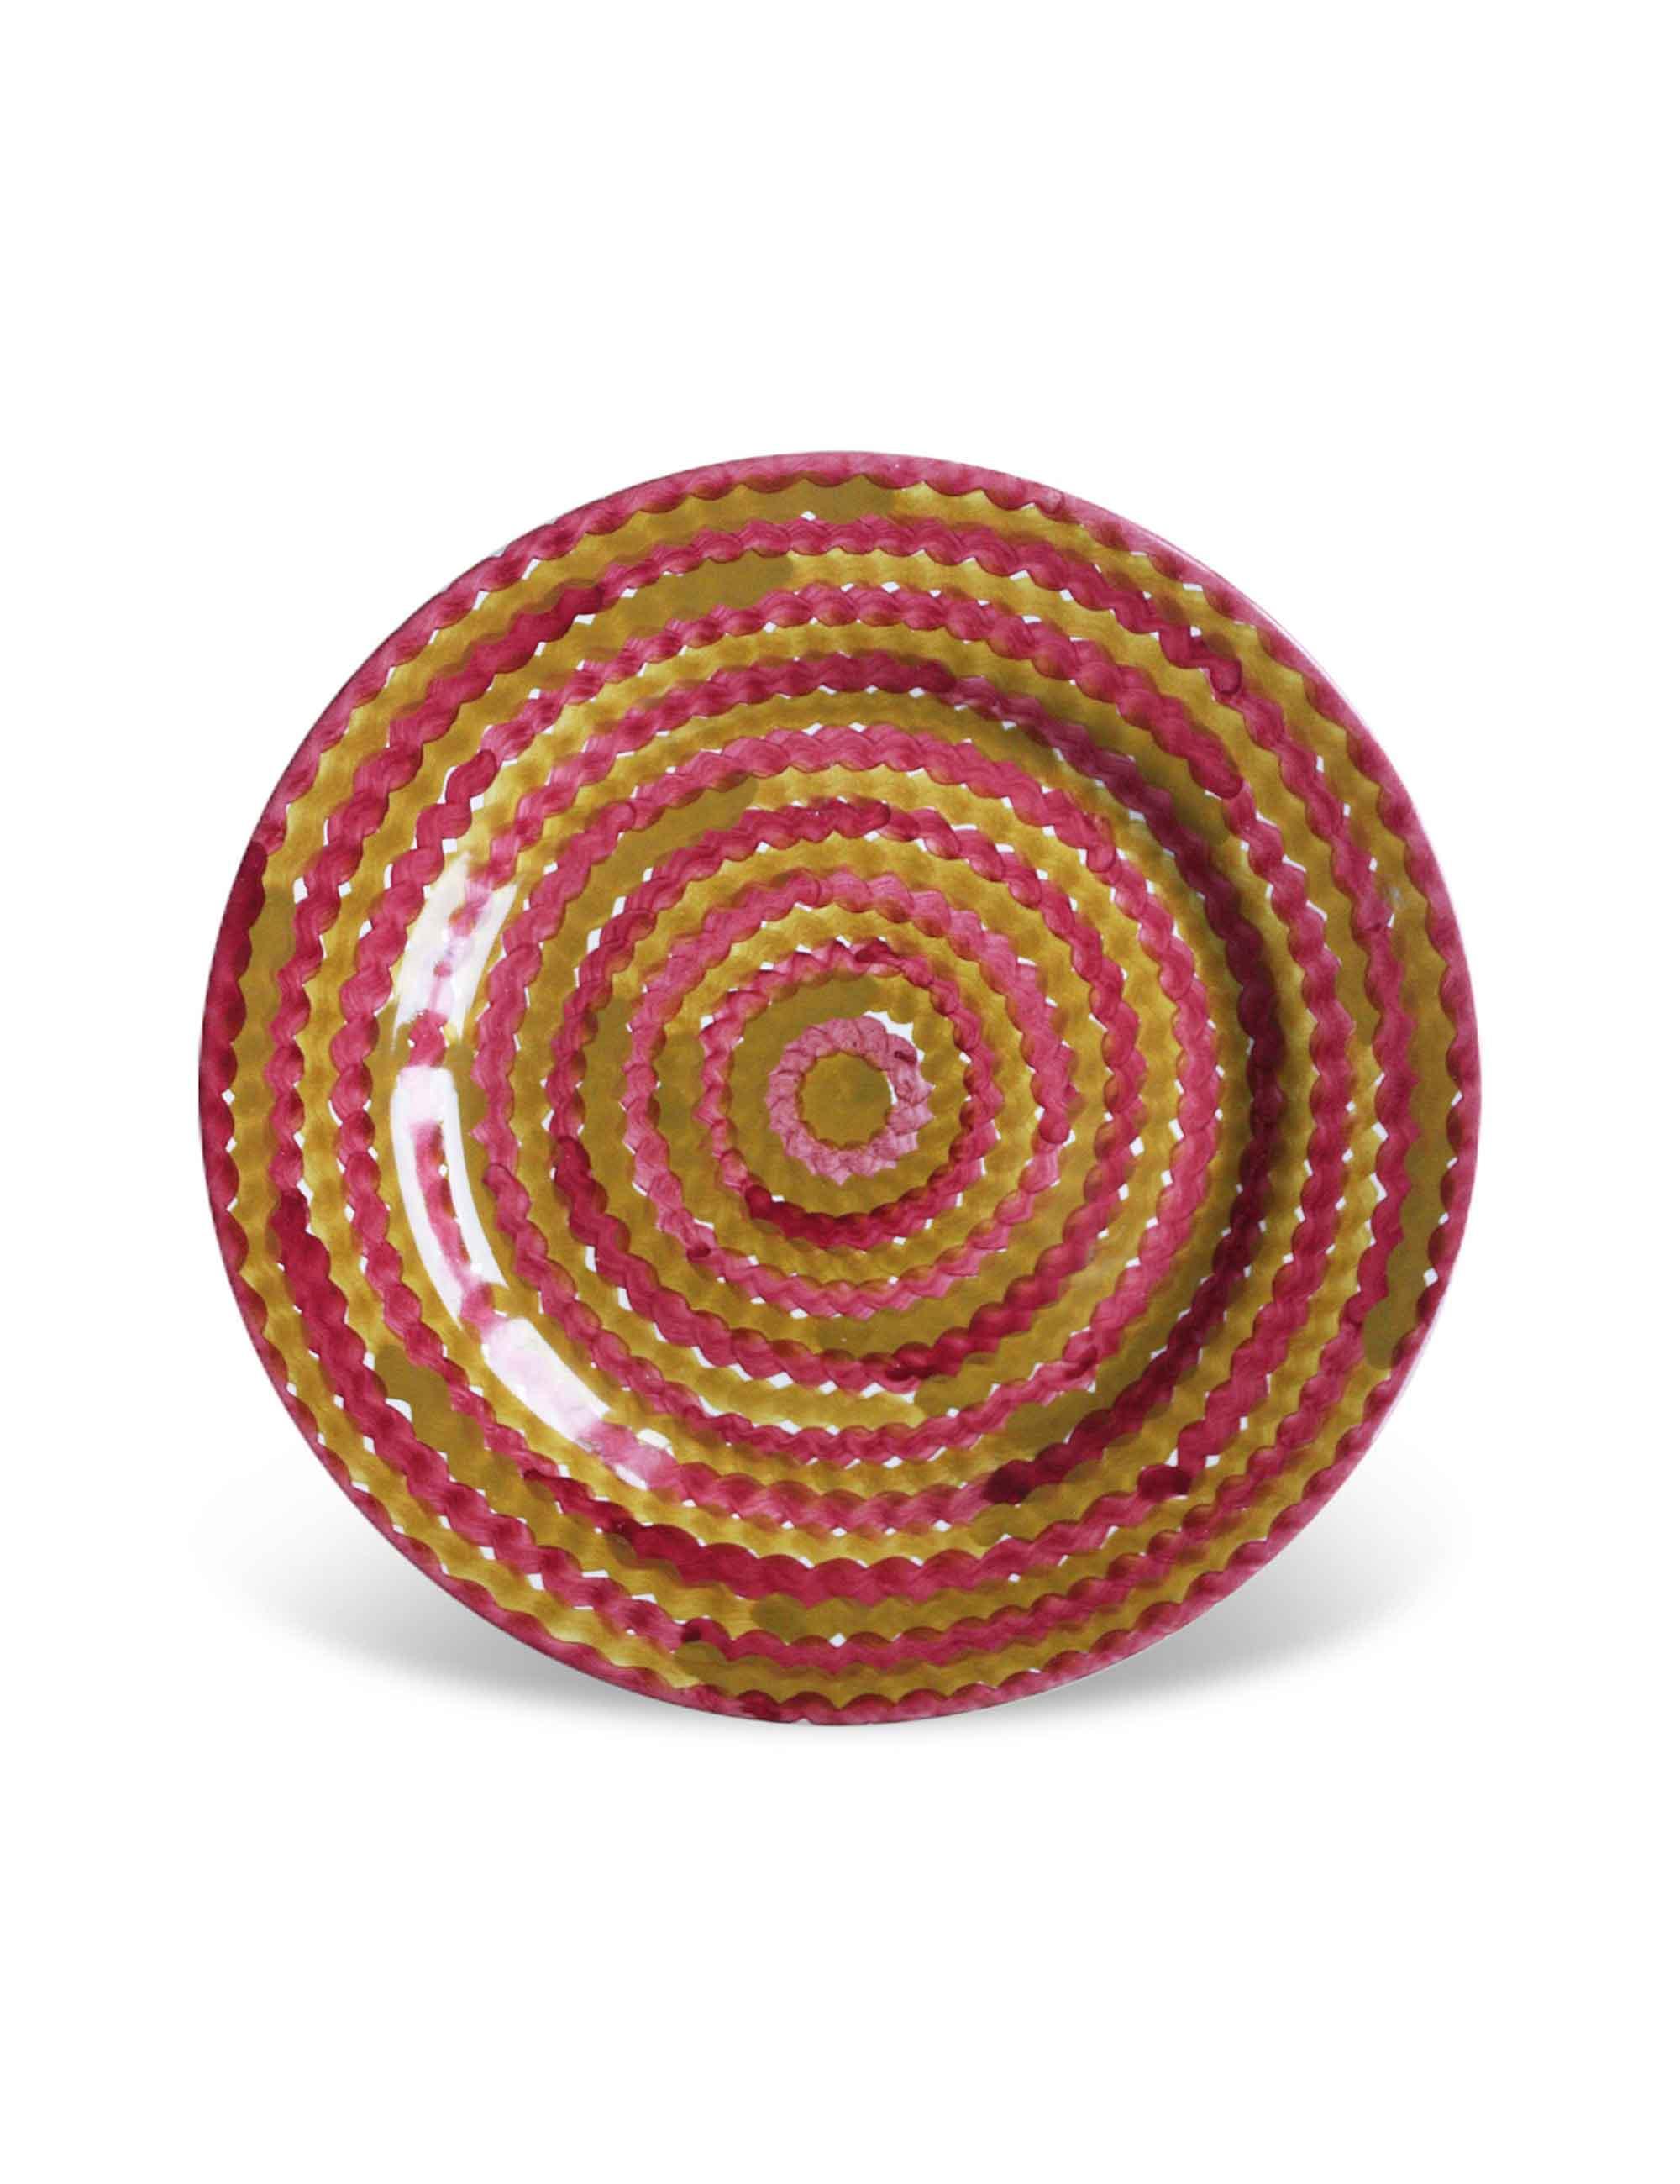 Piatto dessert Mediterra in ceramica decorata di Caltagirone terra bruciata